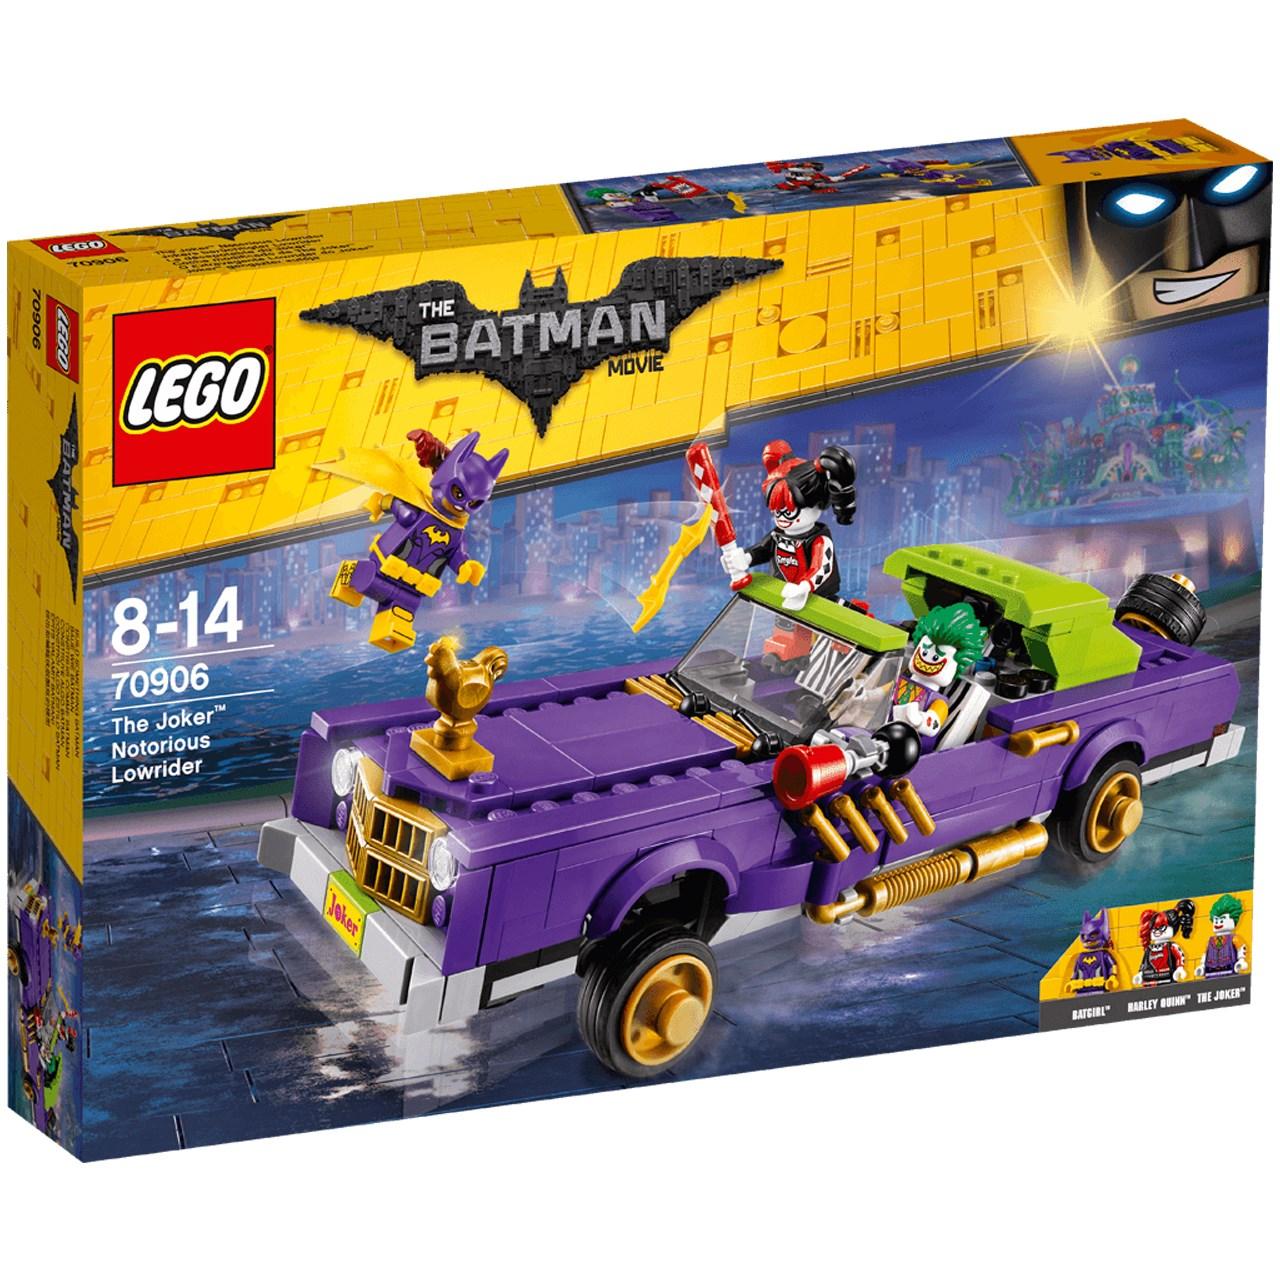 لگو سری Batman مدل The Joker Notorious Lowrider 70906